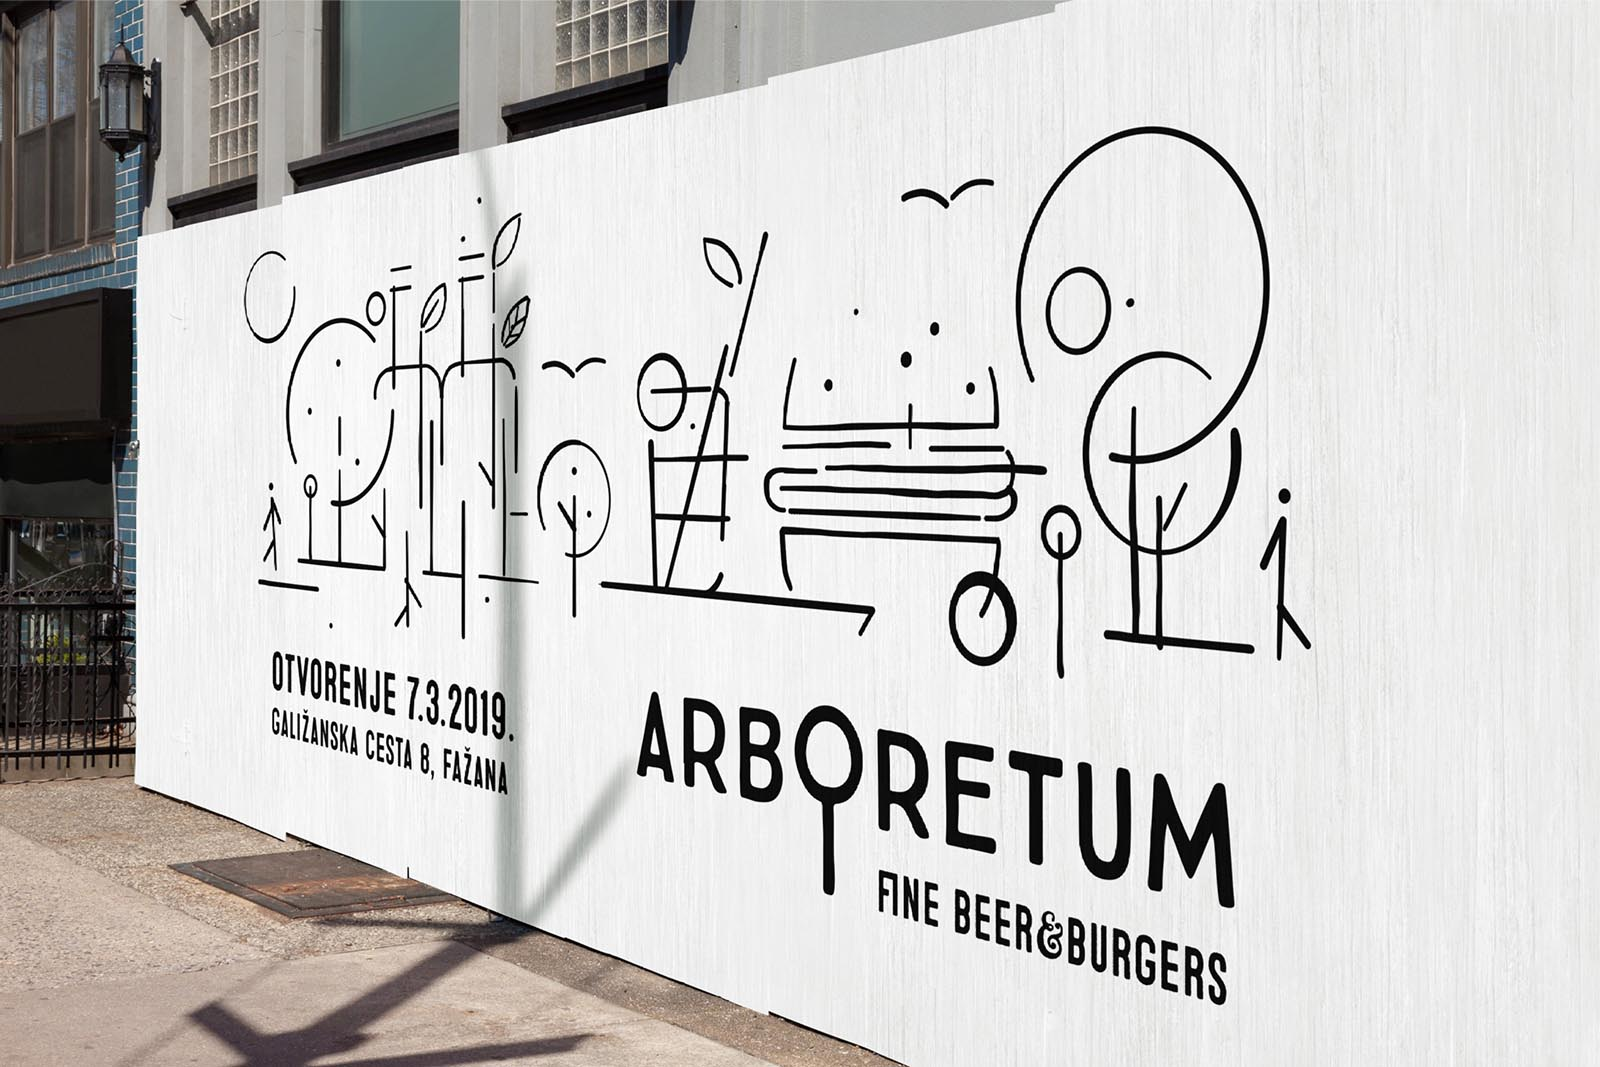 arboretum_pub_billboard_design_branding.jpg